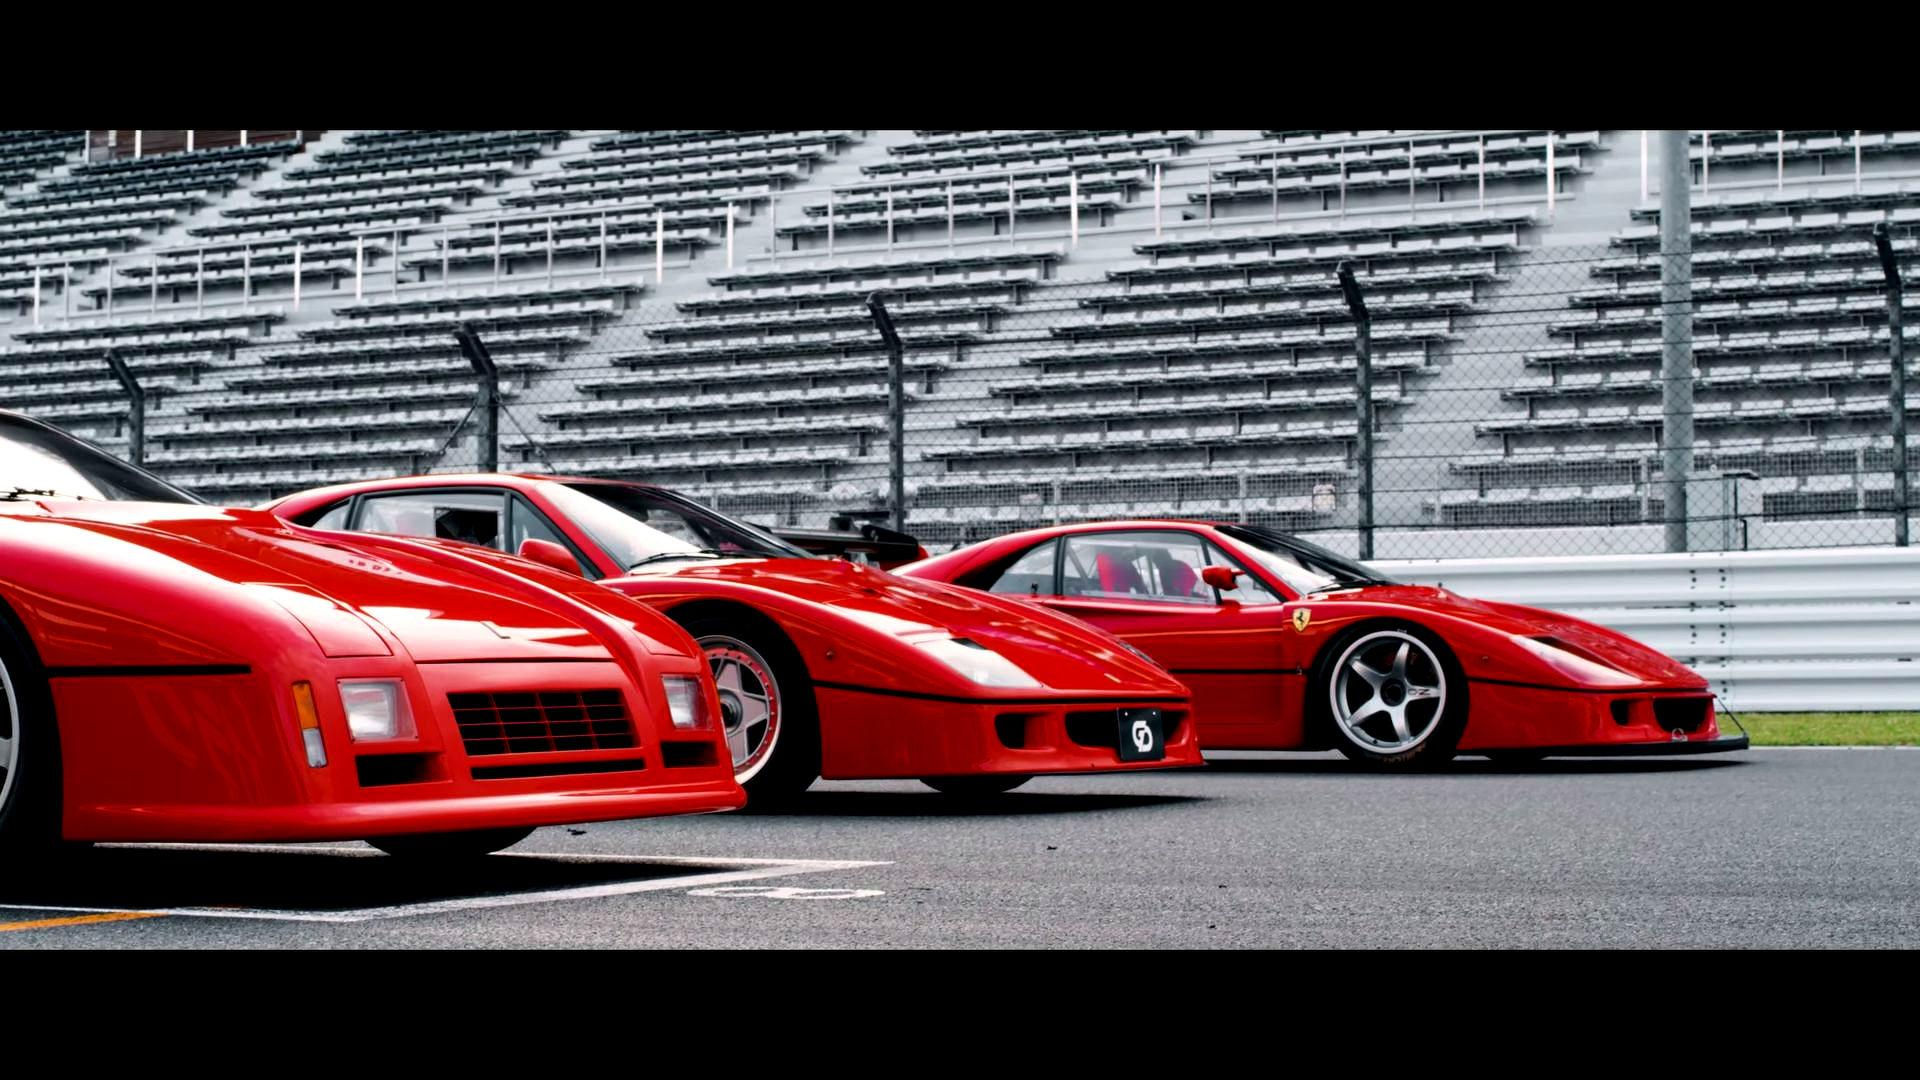 Watch Japanese Gentlemen Honor The Ferrari 288 GTO Evo And F40 LM